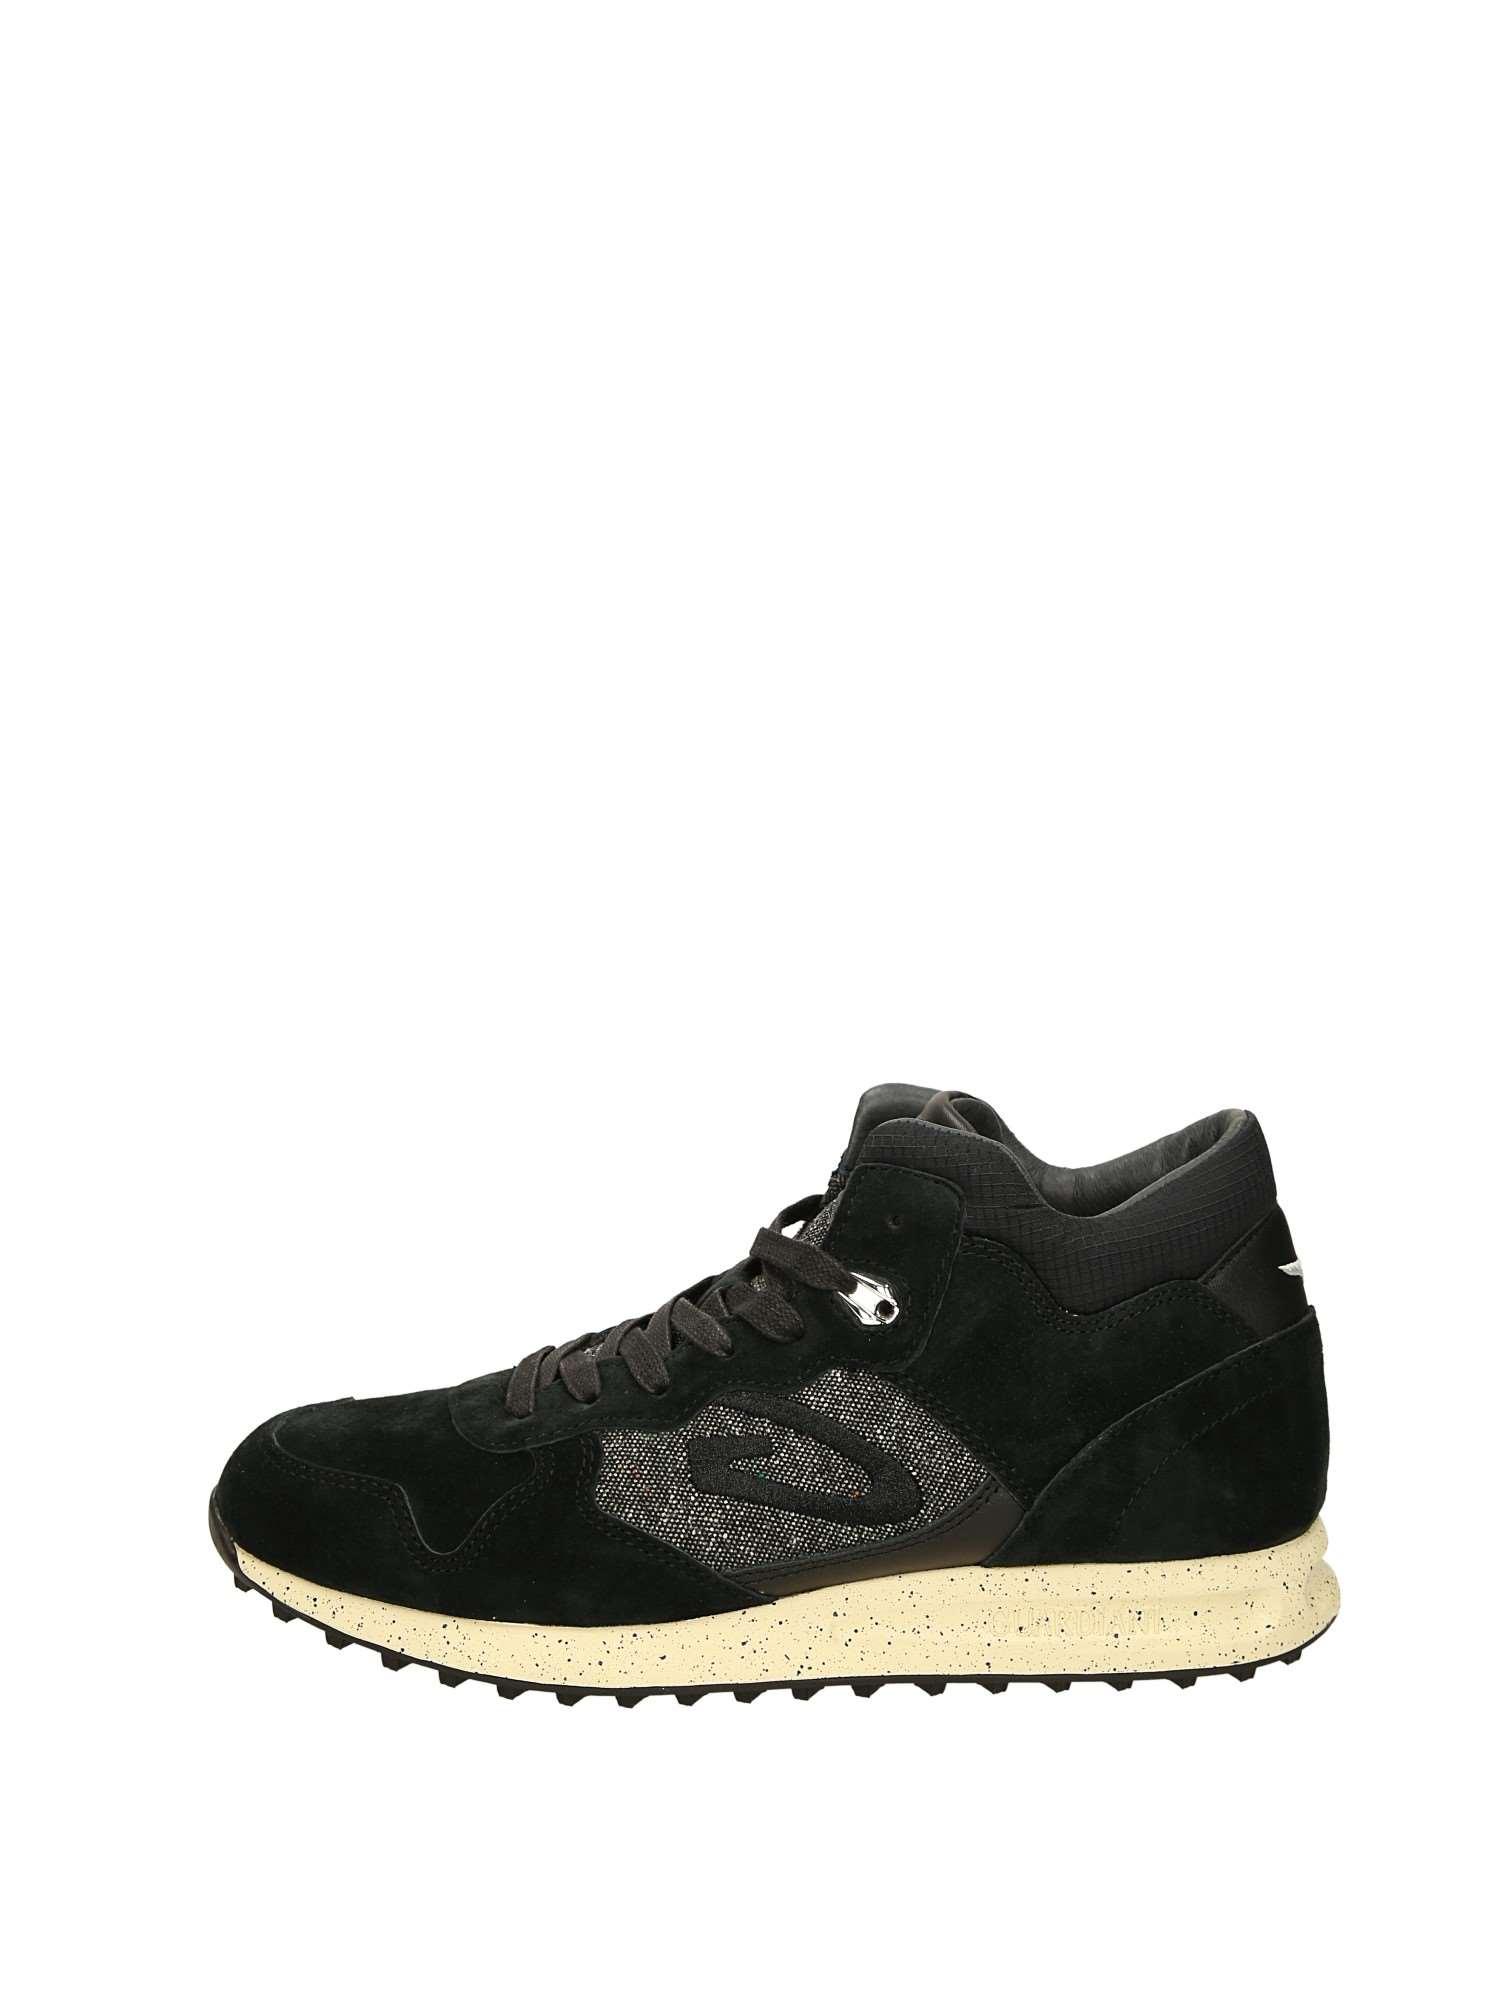 Guardiani Sneakers Alte Uomo Nero   Lalilina